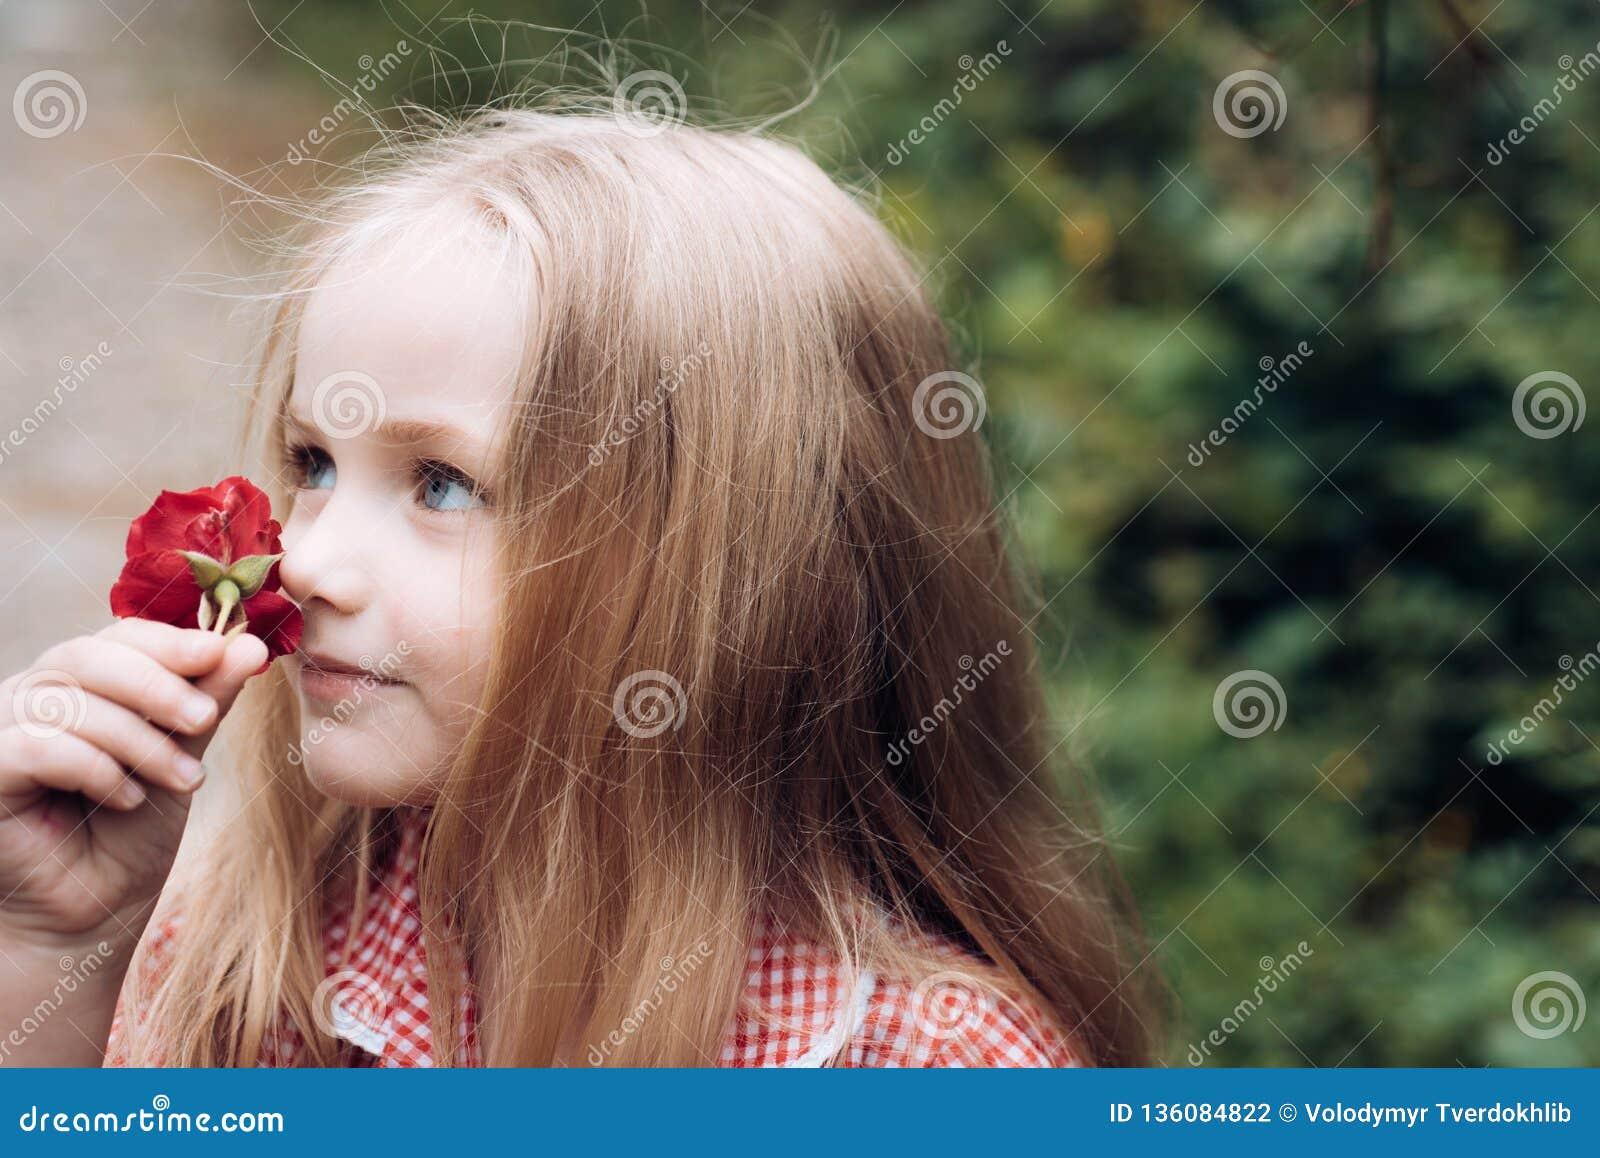 Just rained Παιδική ηλικία Καλοκαίρι Ημέρα μητέρων ή των γυναικών Ημέρα παιδιών Μικρό κοριτσάκι ζωή έννοιας νέα Άνοιξη